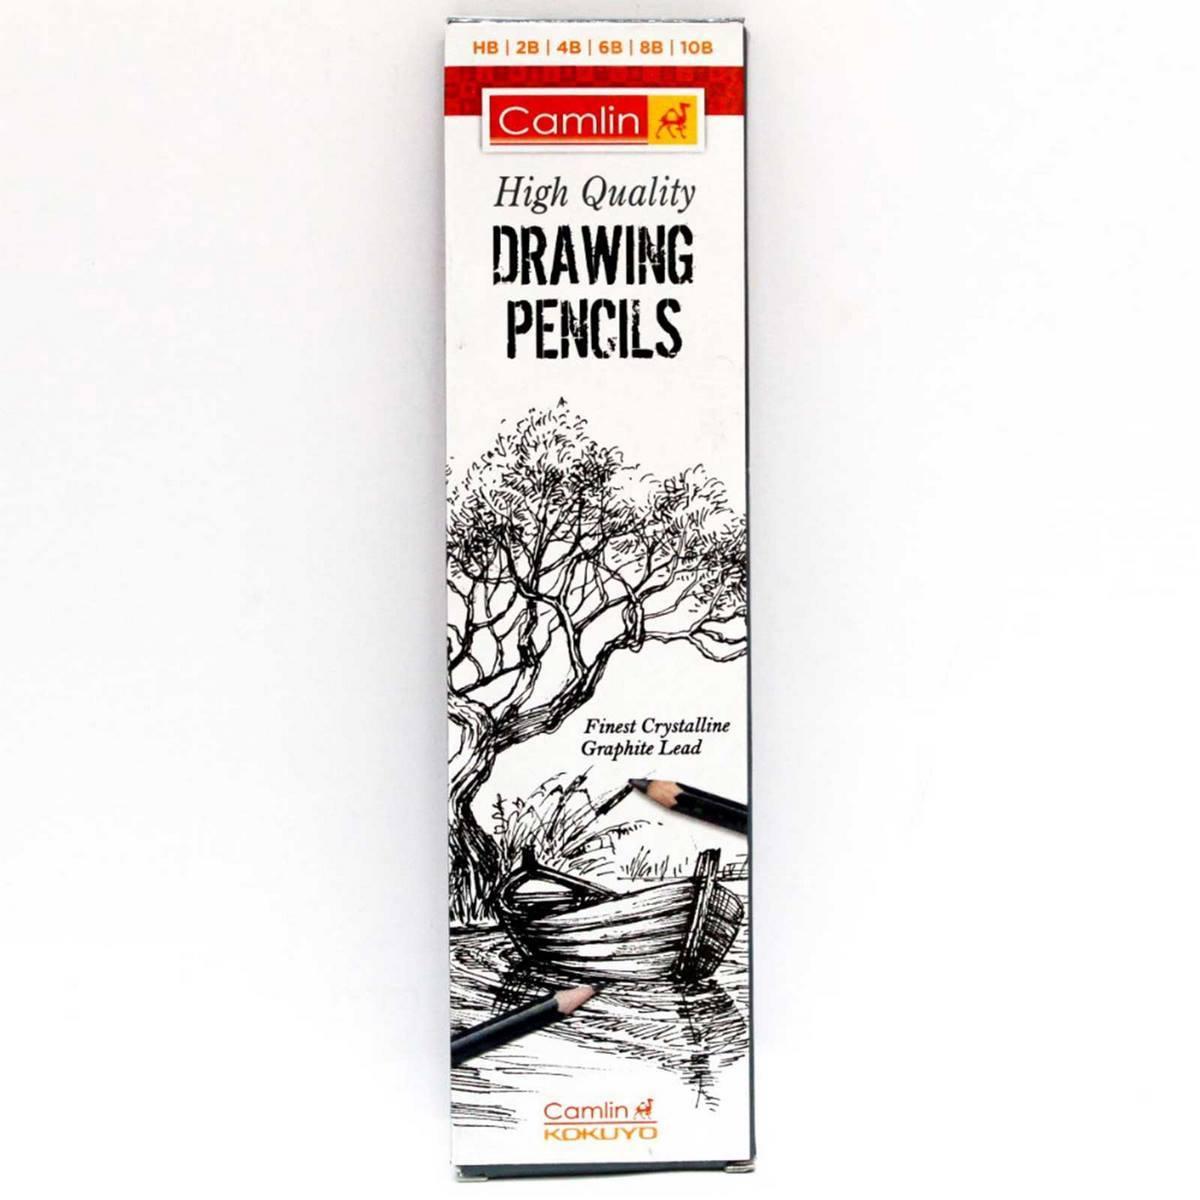 Camlin Drawing Pencils (HB, 2B, 4B, 6B, 8B, 10B) Black 7000953